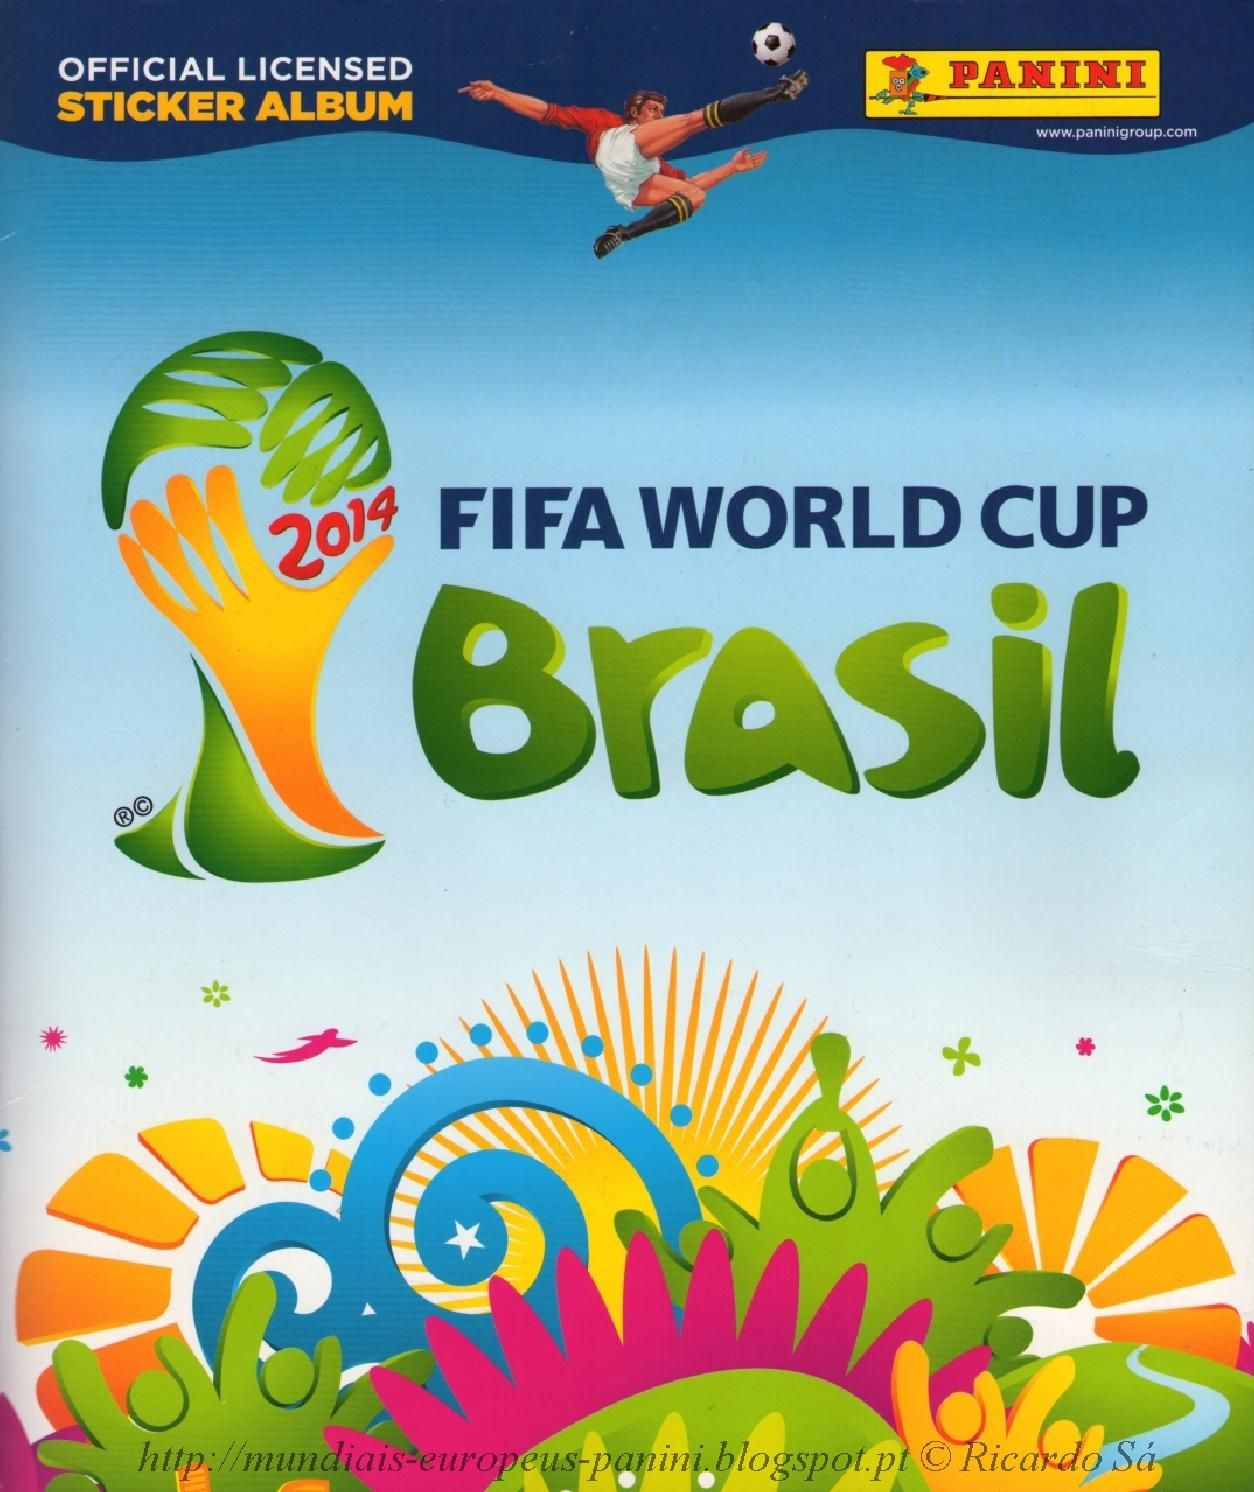 Album Fifa World Cup Brazil 2014 Panini Brazil World Cup World Cup Fifa World Cup